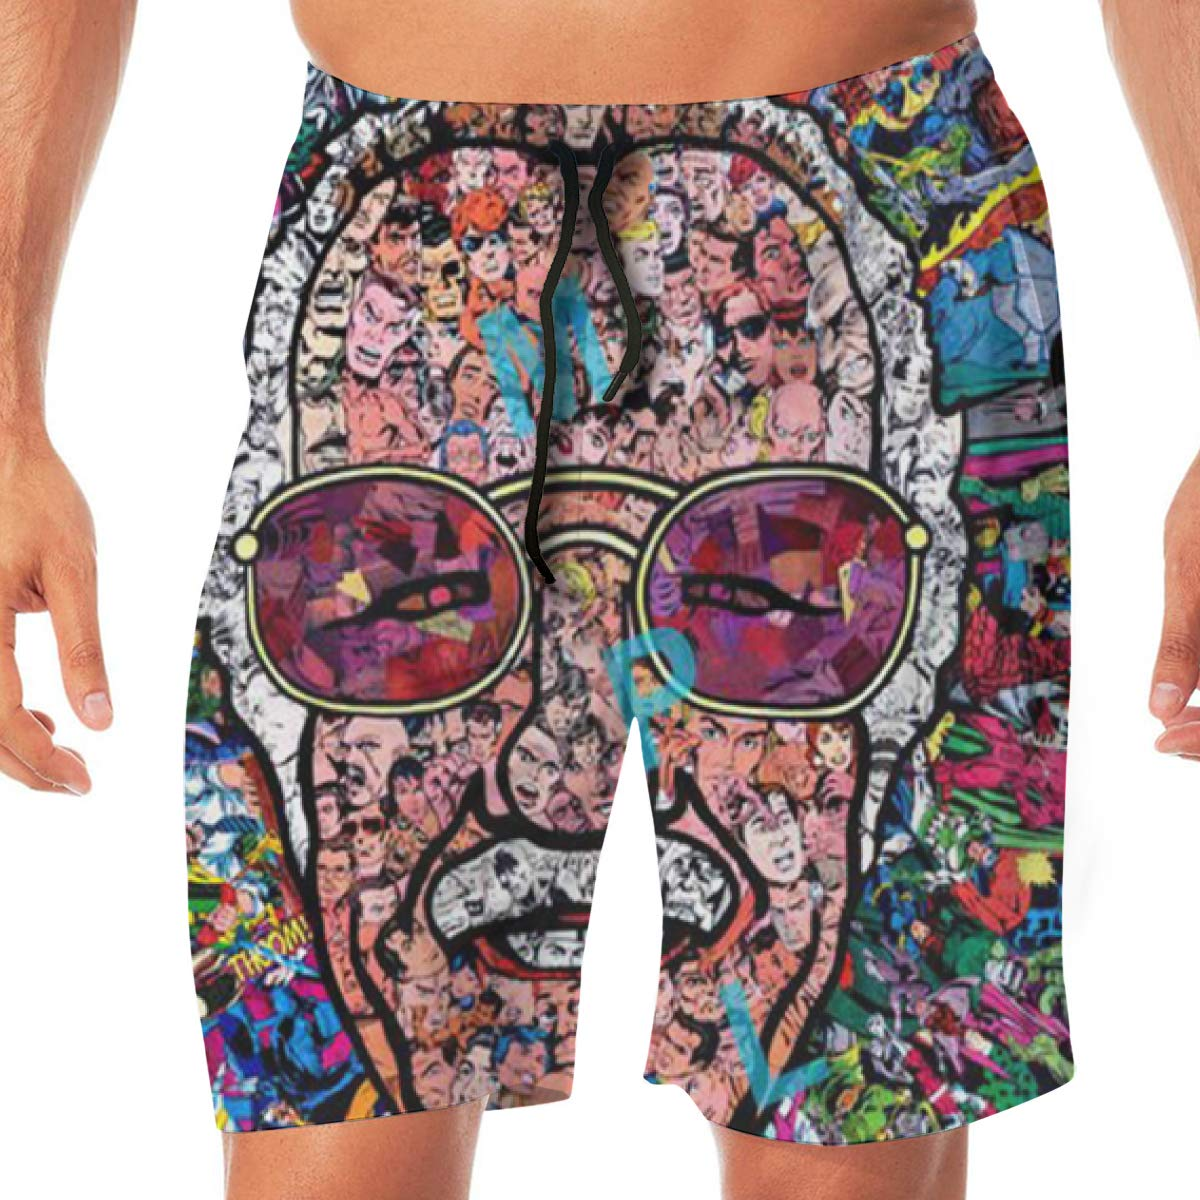 Mens Shorts Trunk Summer Pockets Father of Cartoons Swim Beach Athletic Quick Dry Beachwear Boardshort